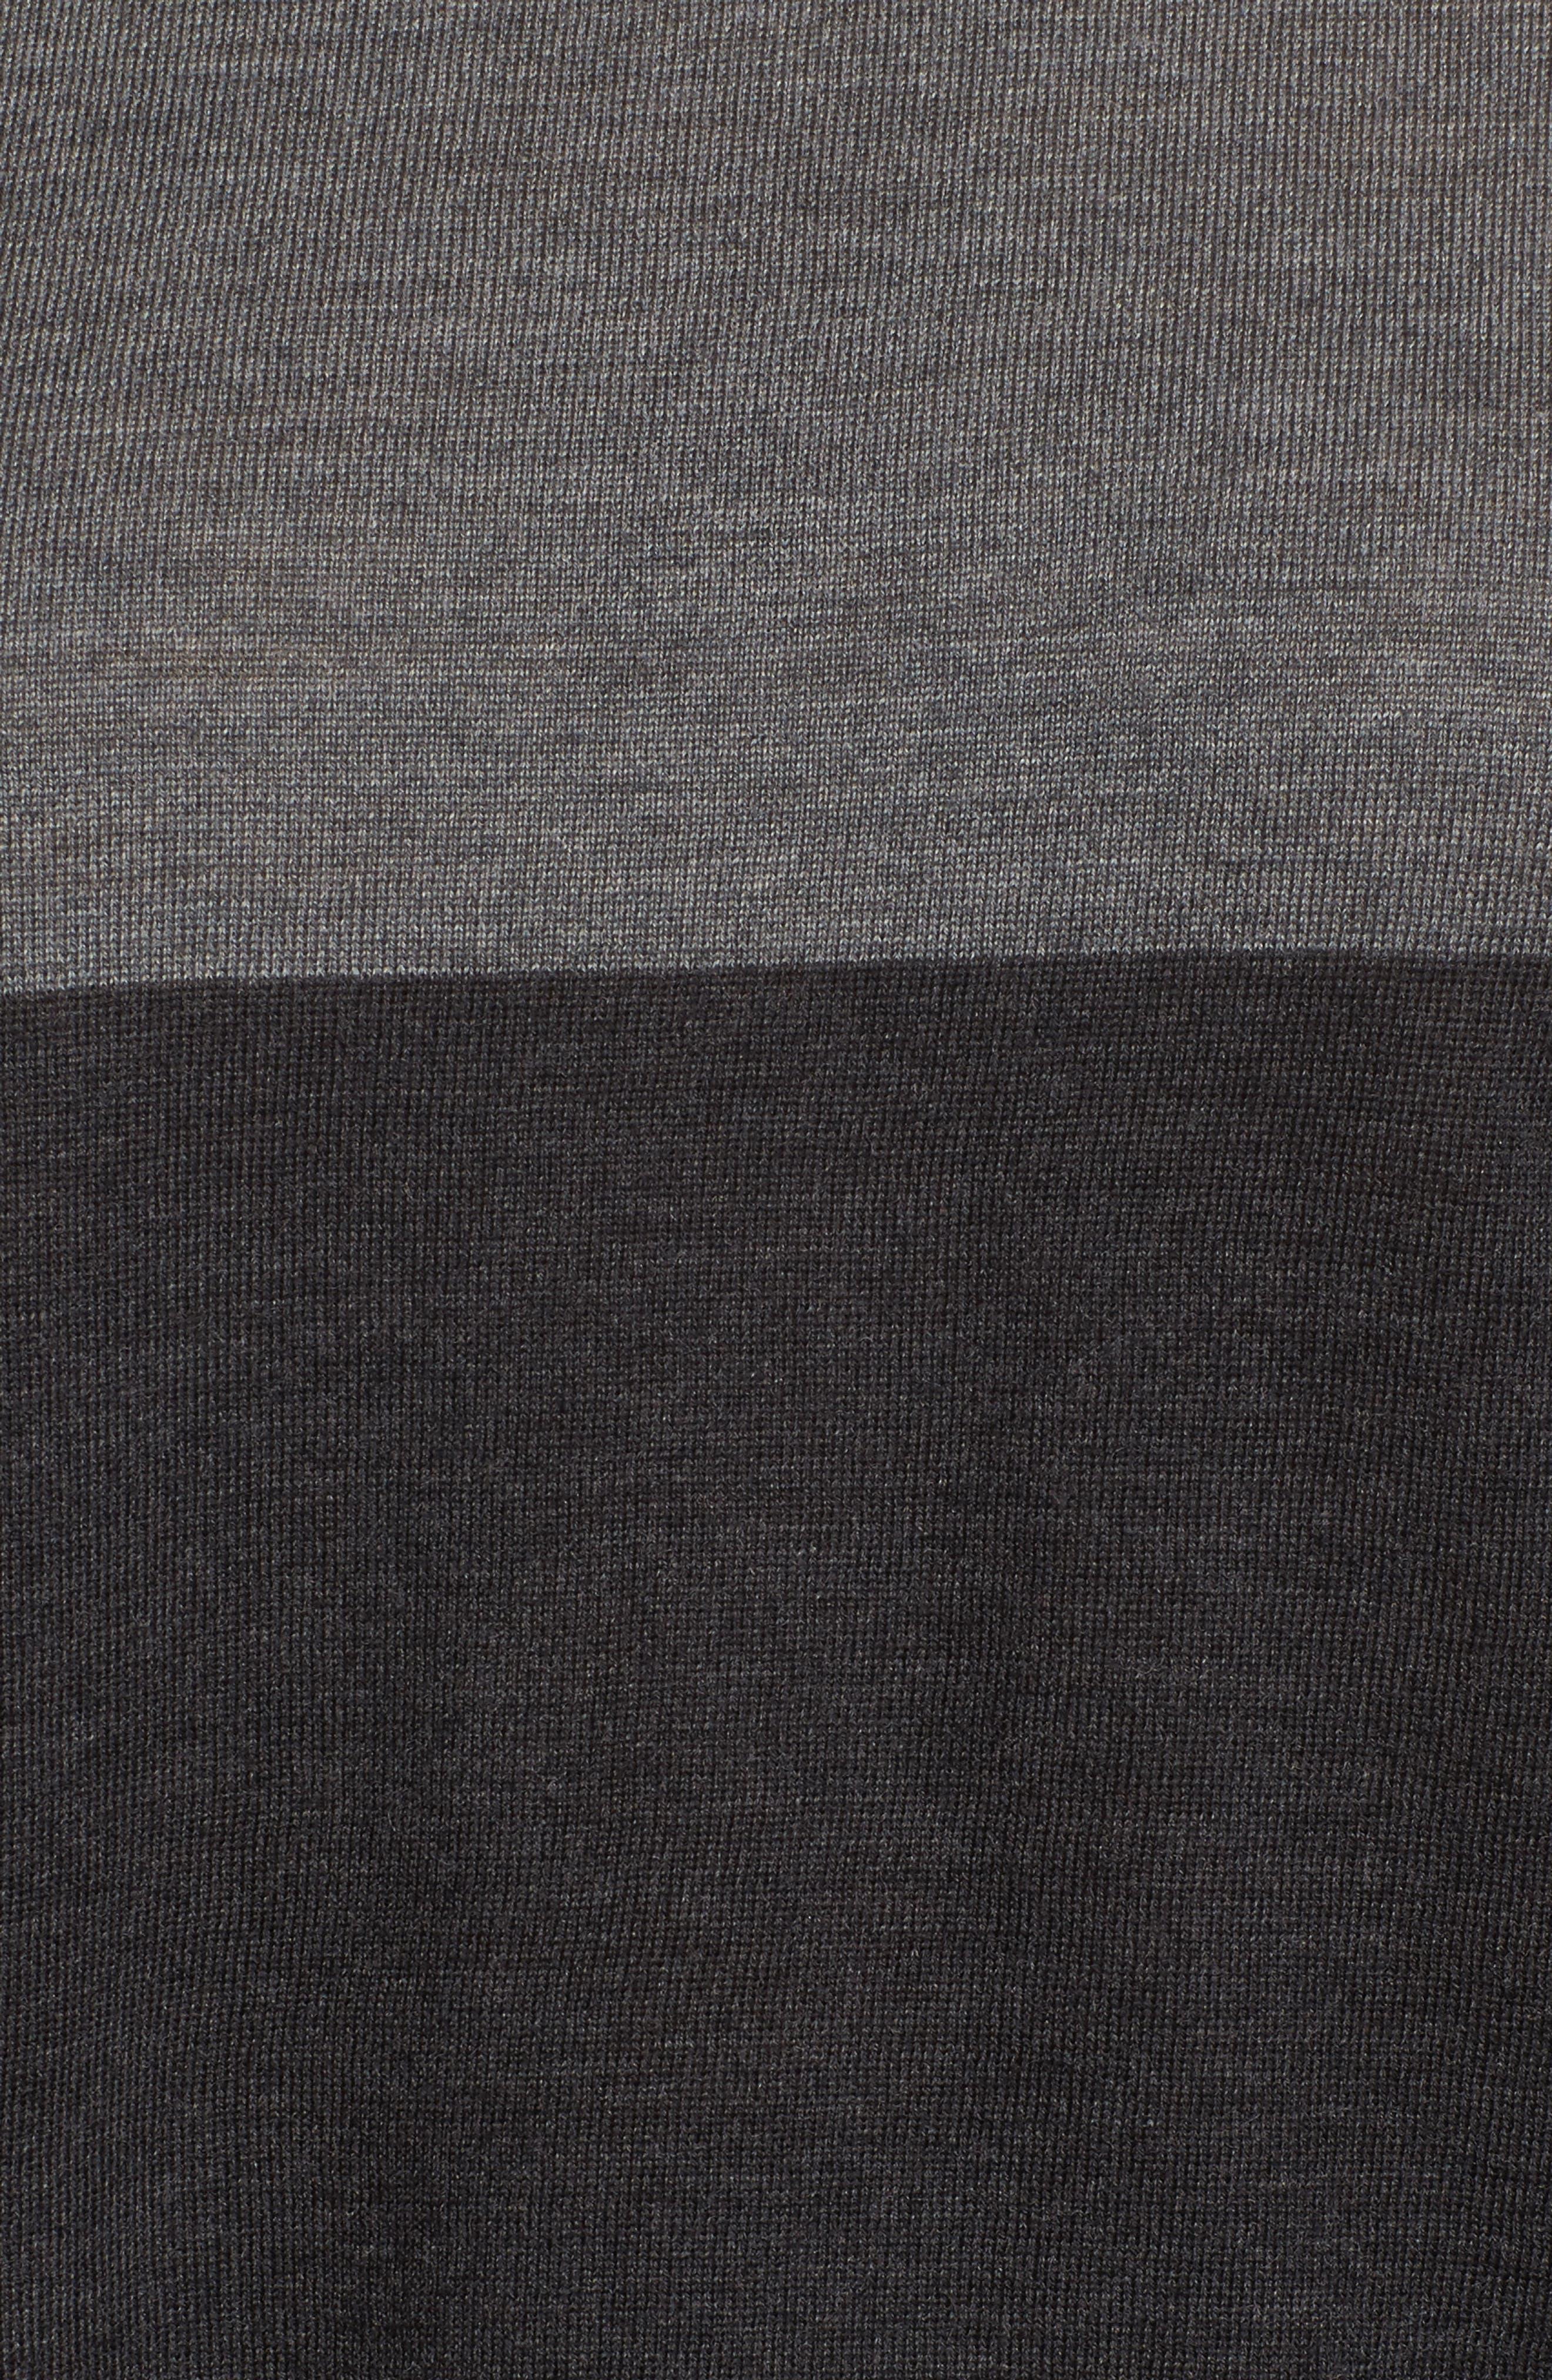 Colorblock Boxy Merino Wool Sweater,                             Alternate thumbnail 5, color,                             021